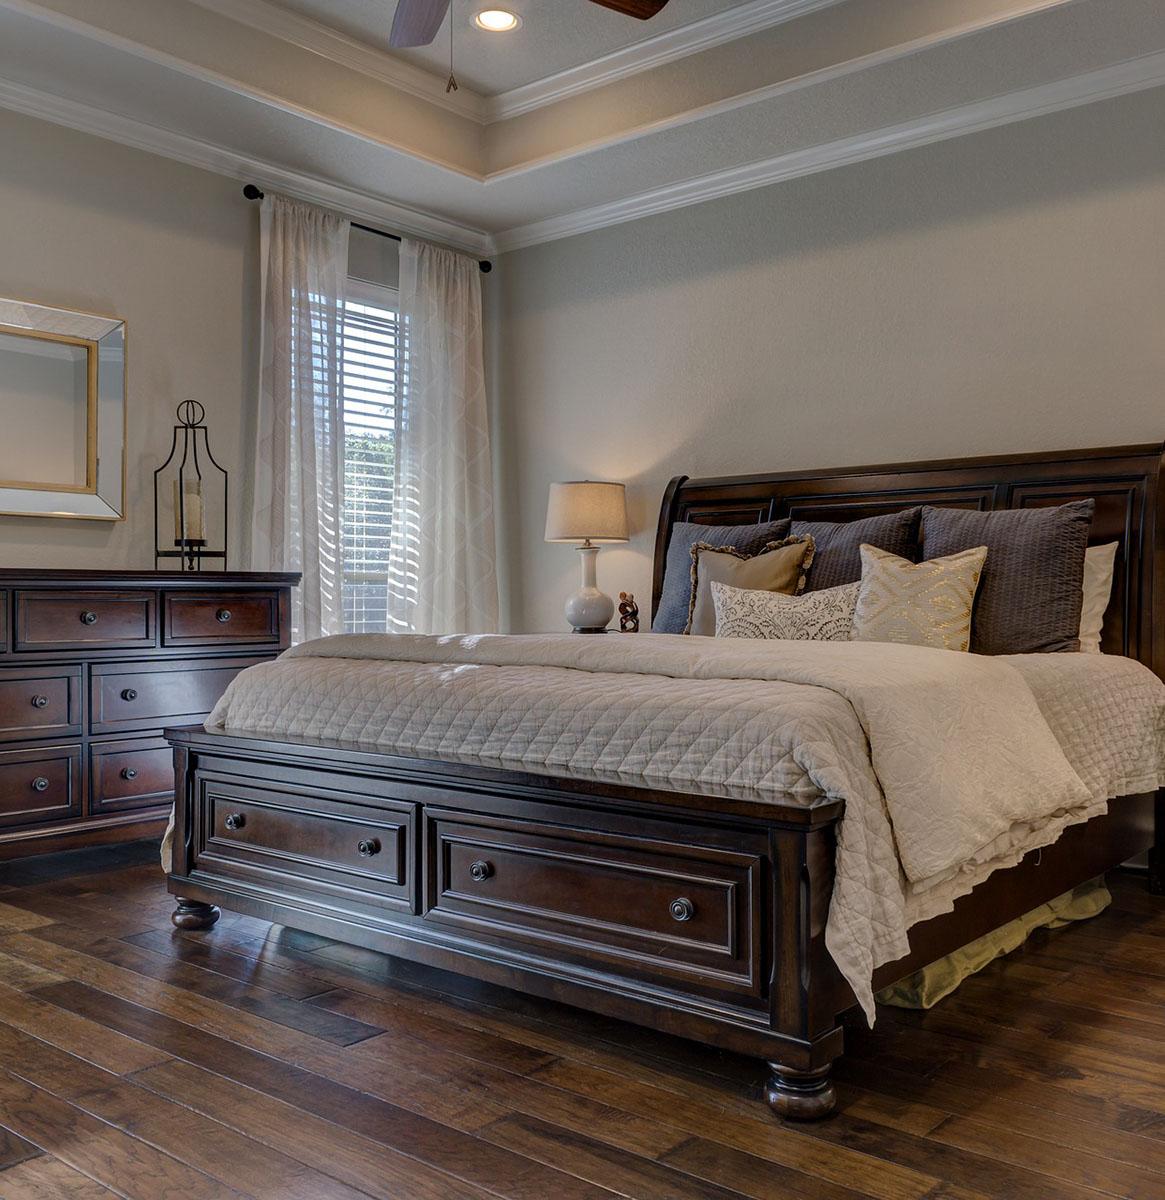 traditional-interior-design-style-main-image